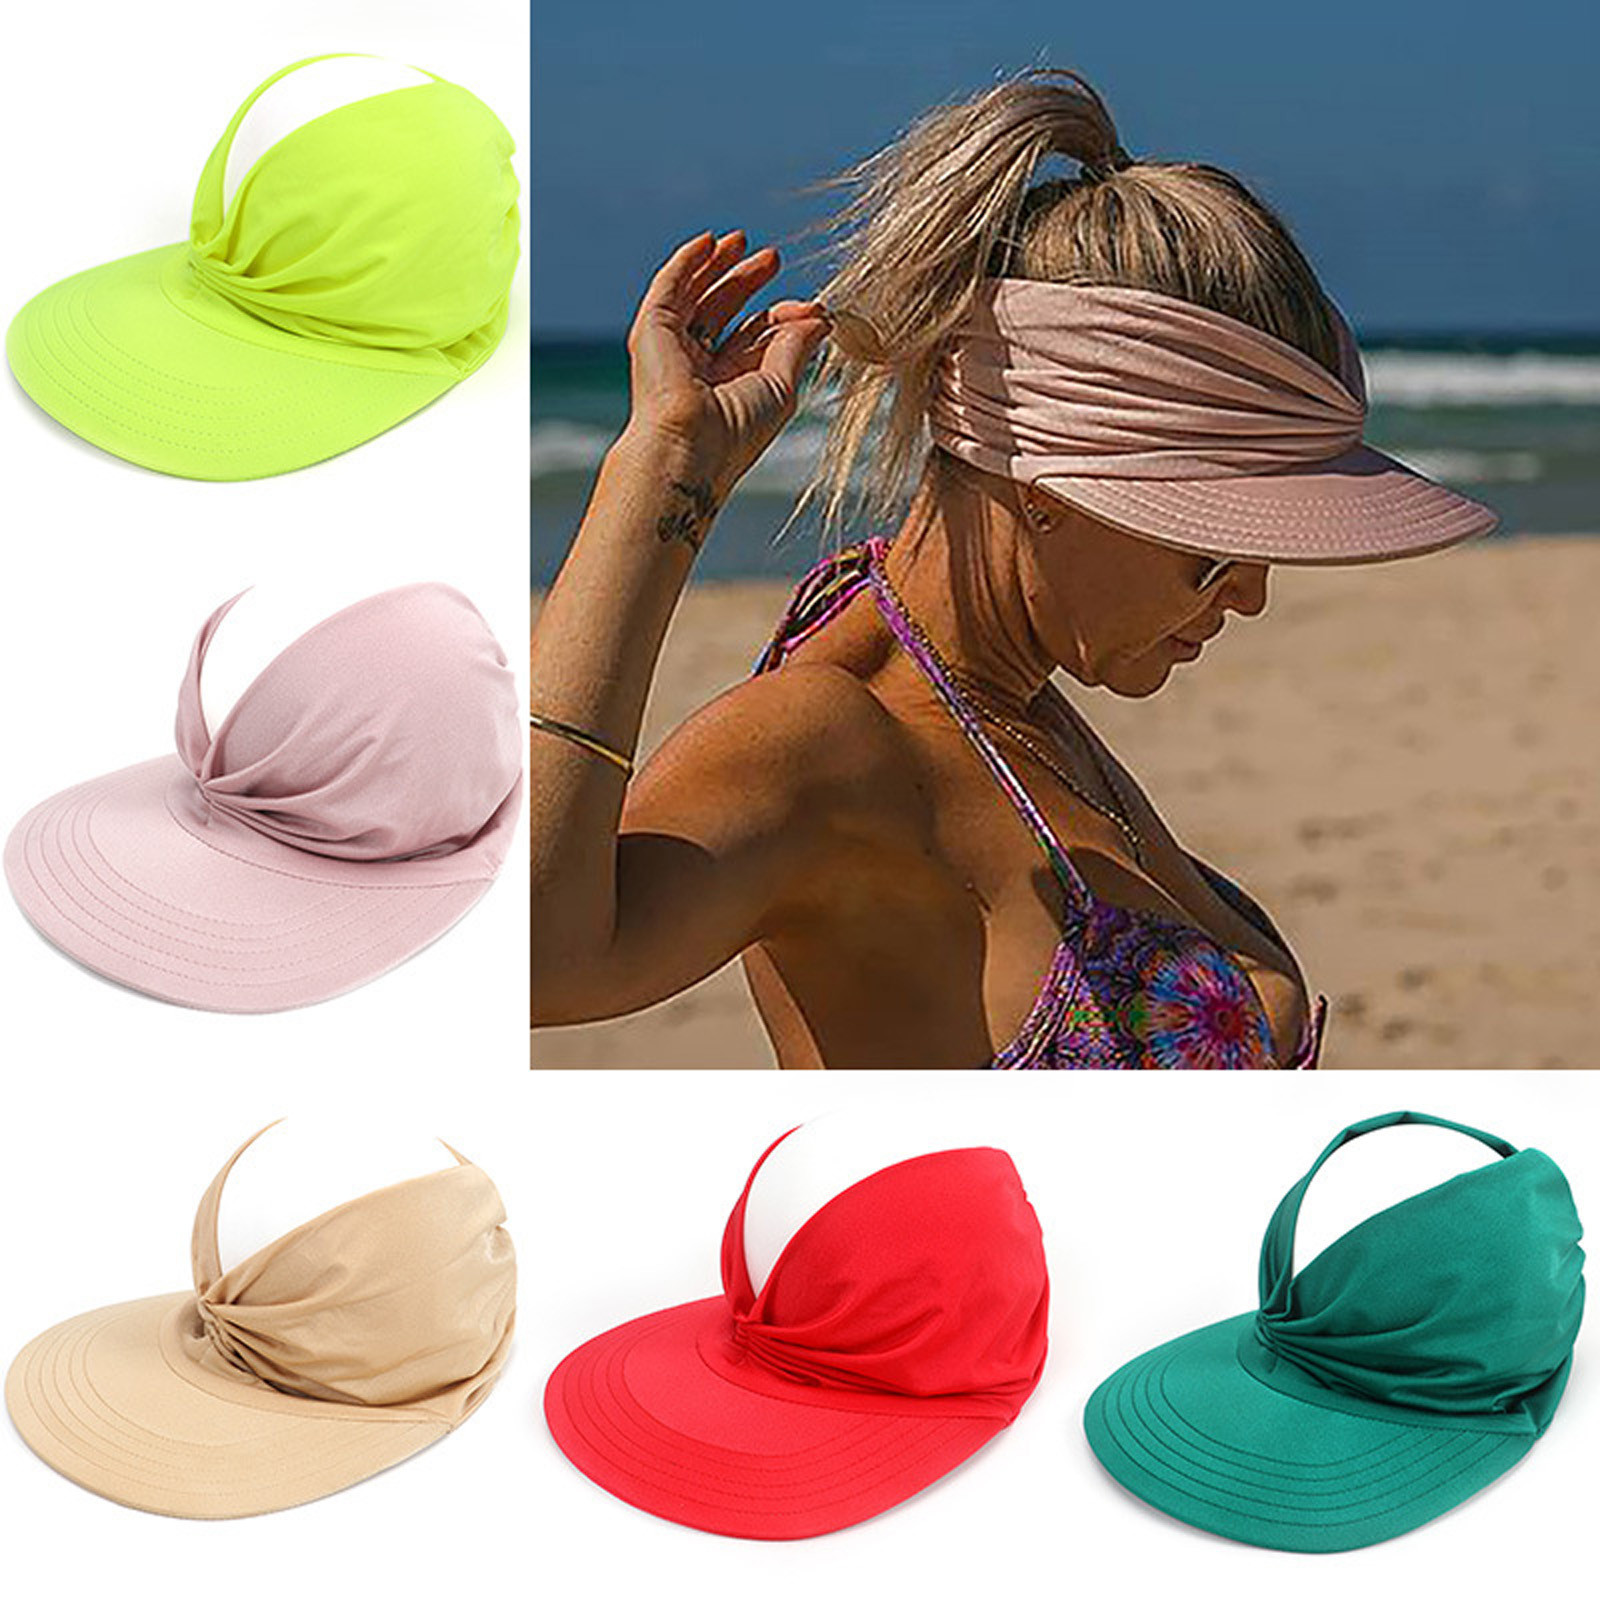 New Arrival Summer Hat Women's Sun Visor Sun Hat Anti-ultraviolet Elastic Hollow Top Hat New Casual Caps Gorras